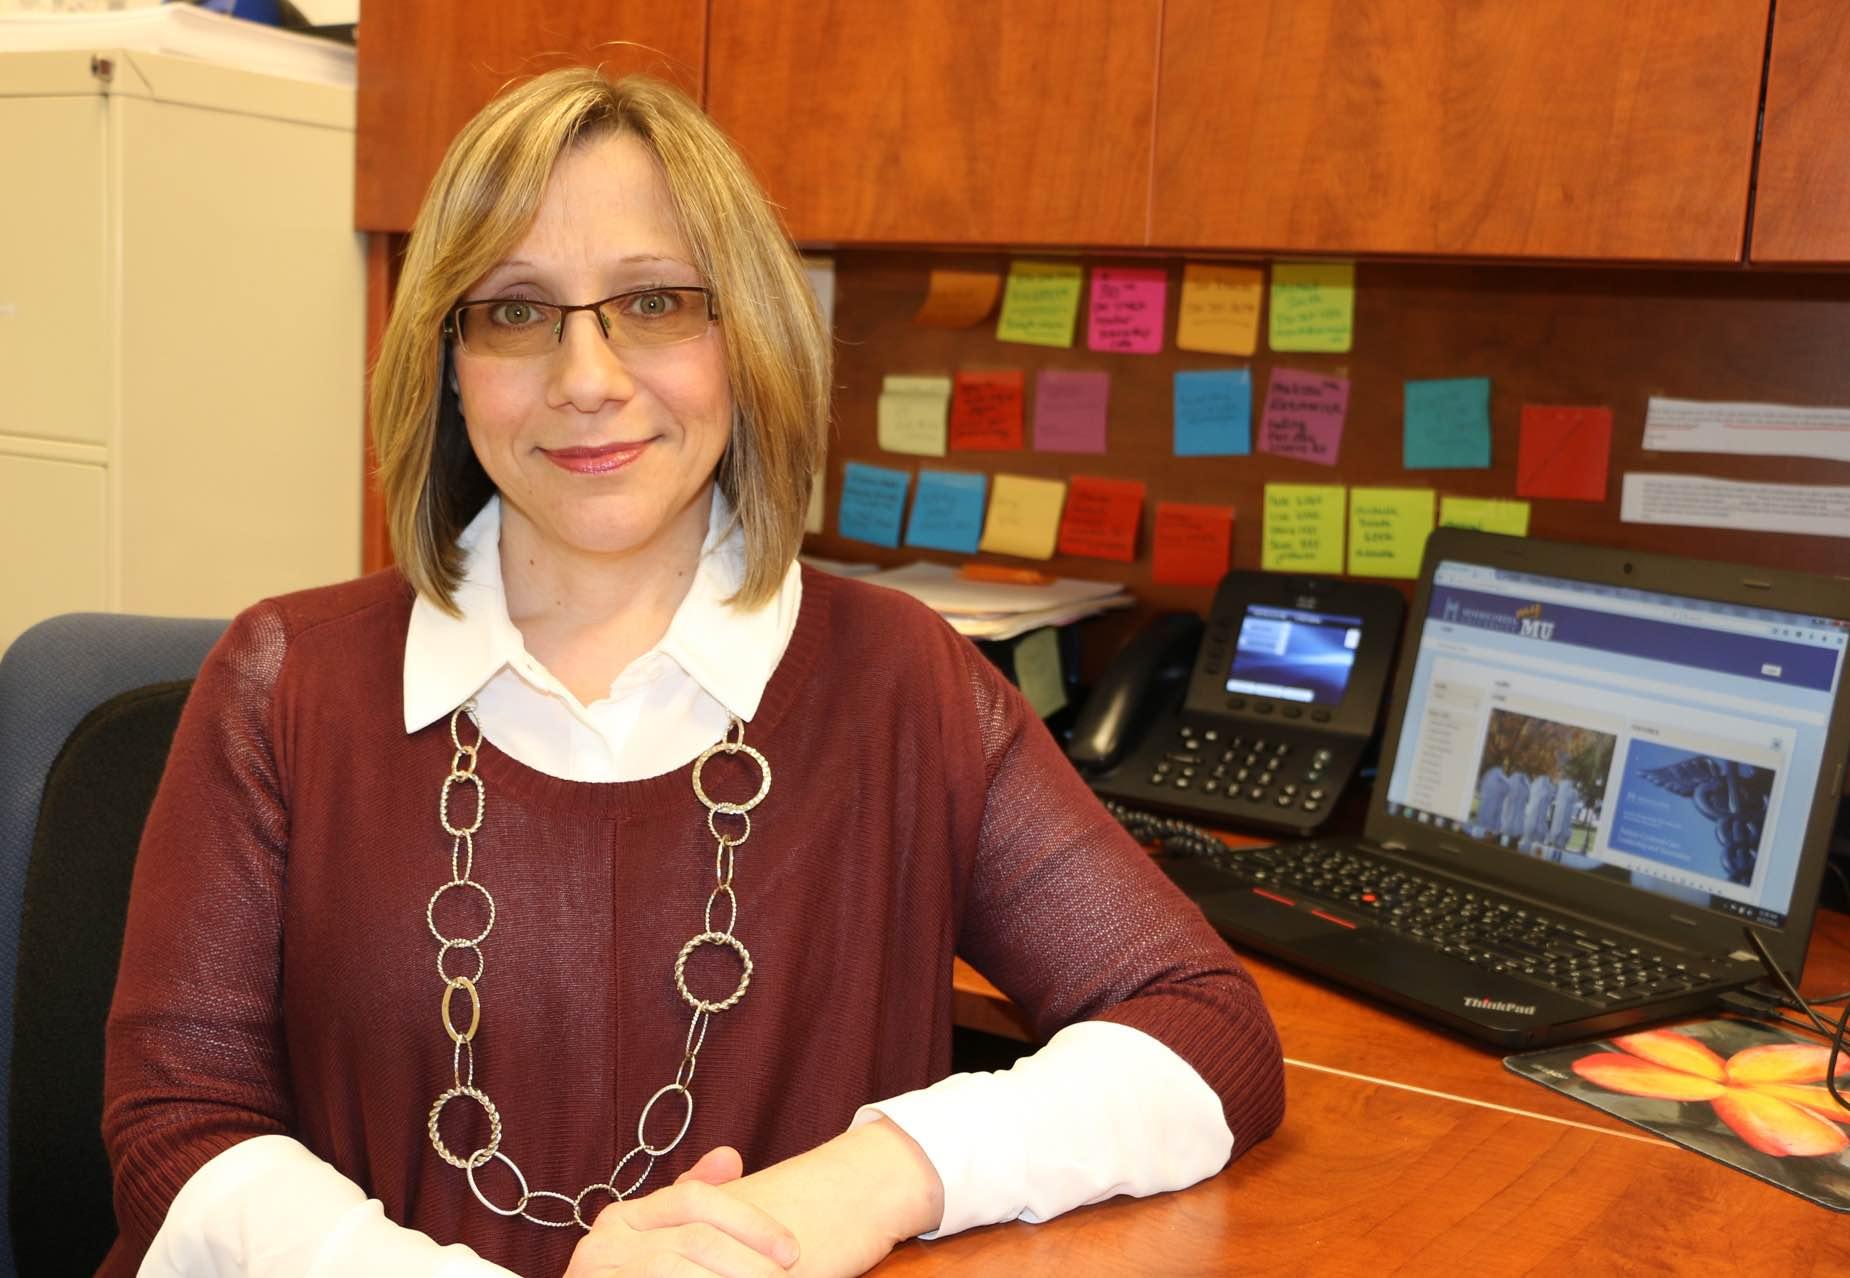 Karen Cefalo, Assistant Director of Part-Time & Graduate Admissions